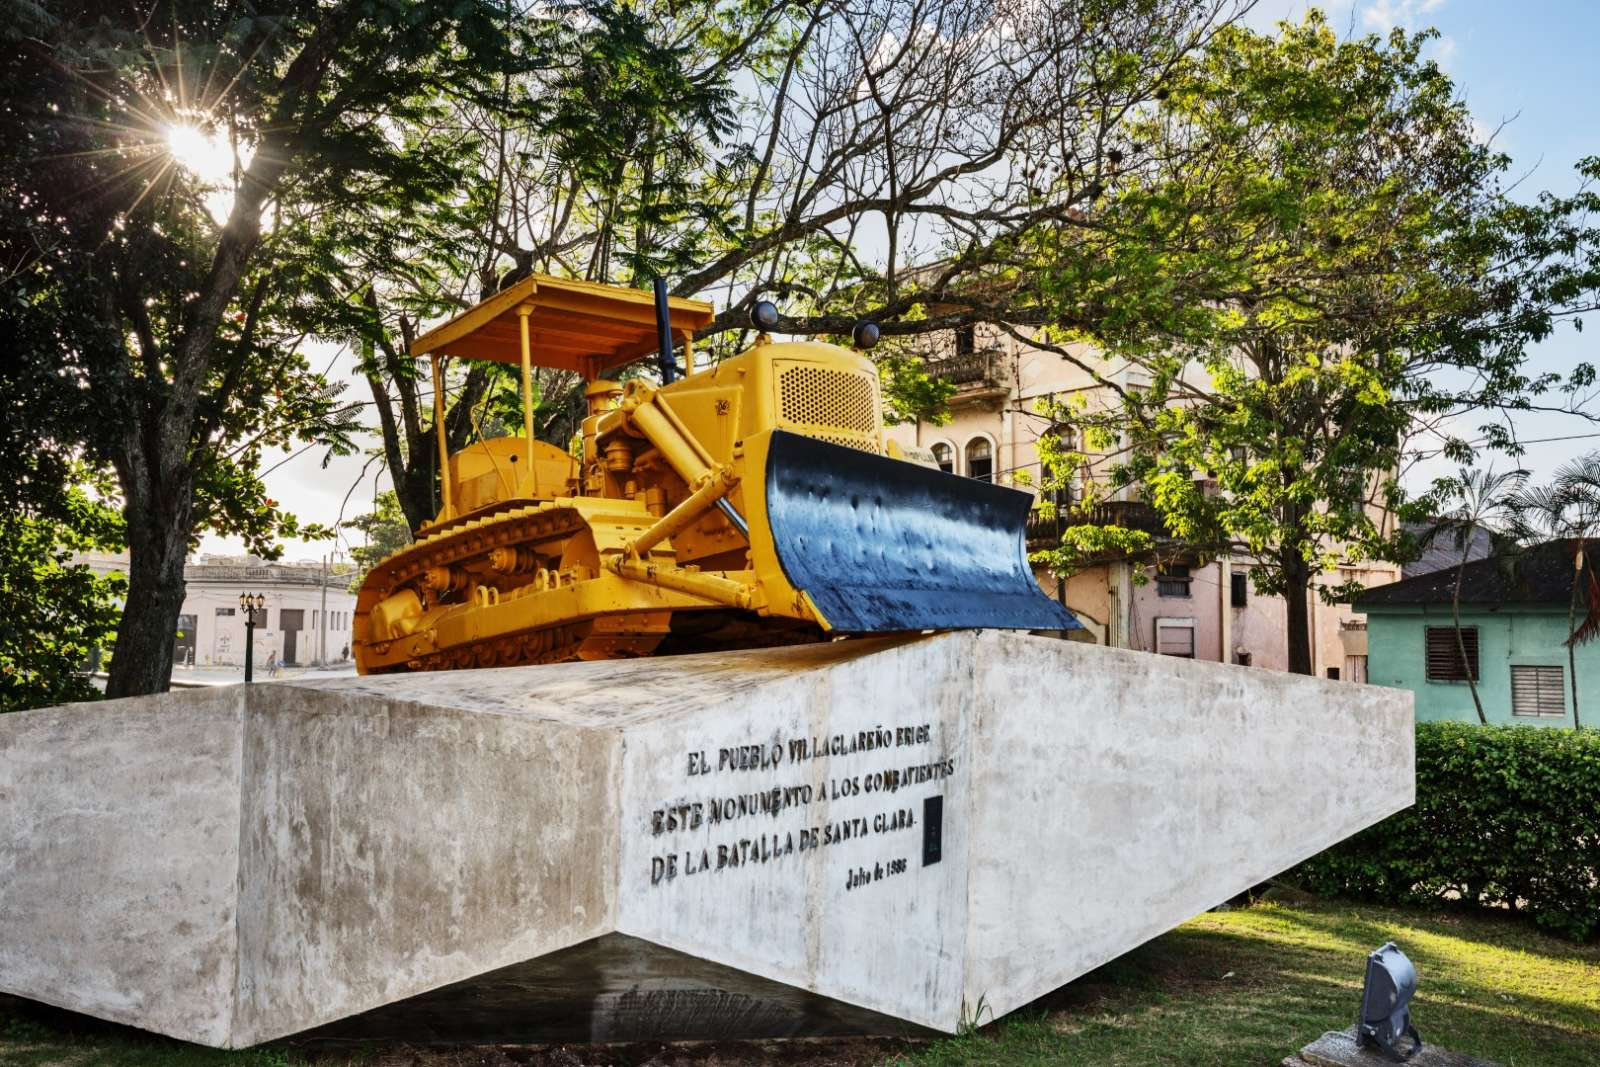 Bulldozer monument at Museum Tren Blindado, Santa Clara, Cuba